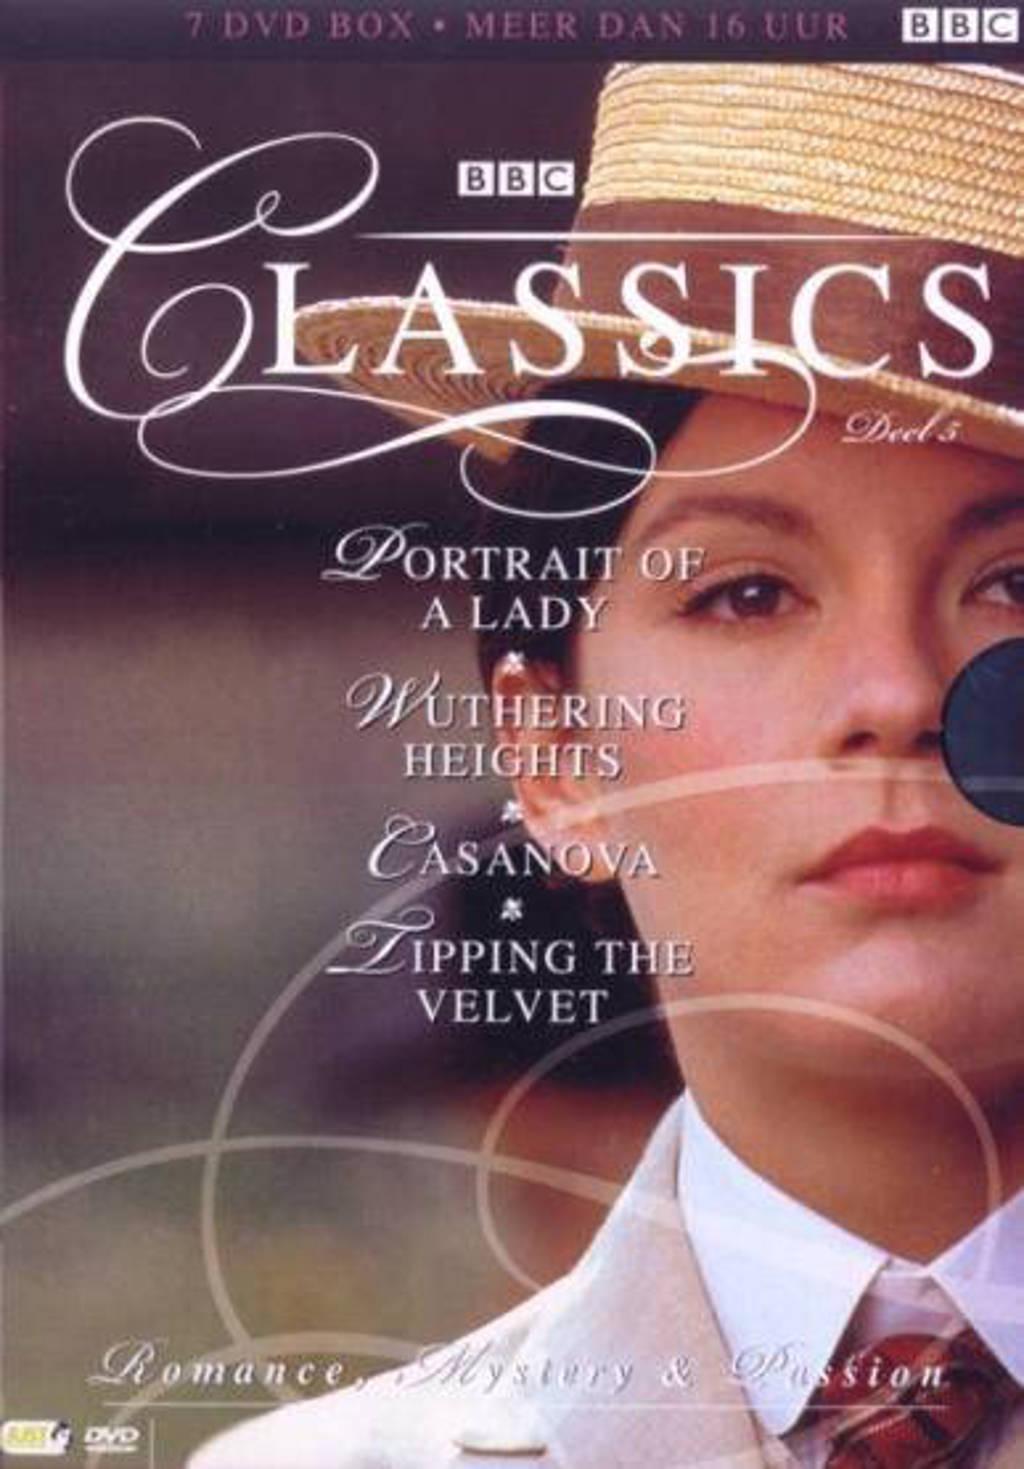 BBC classics collection 5 (DVD)